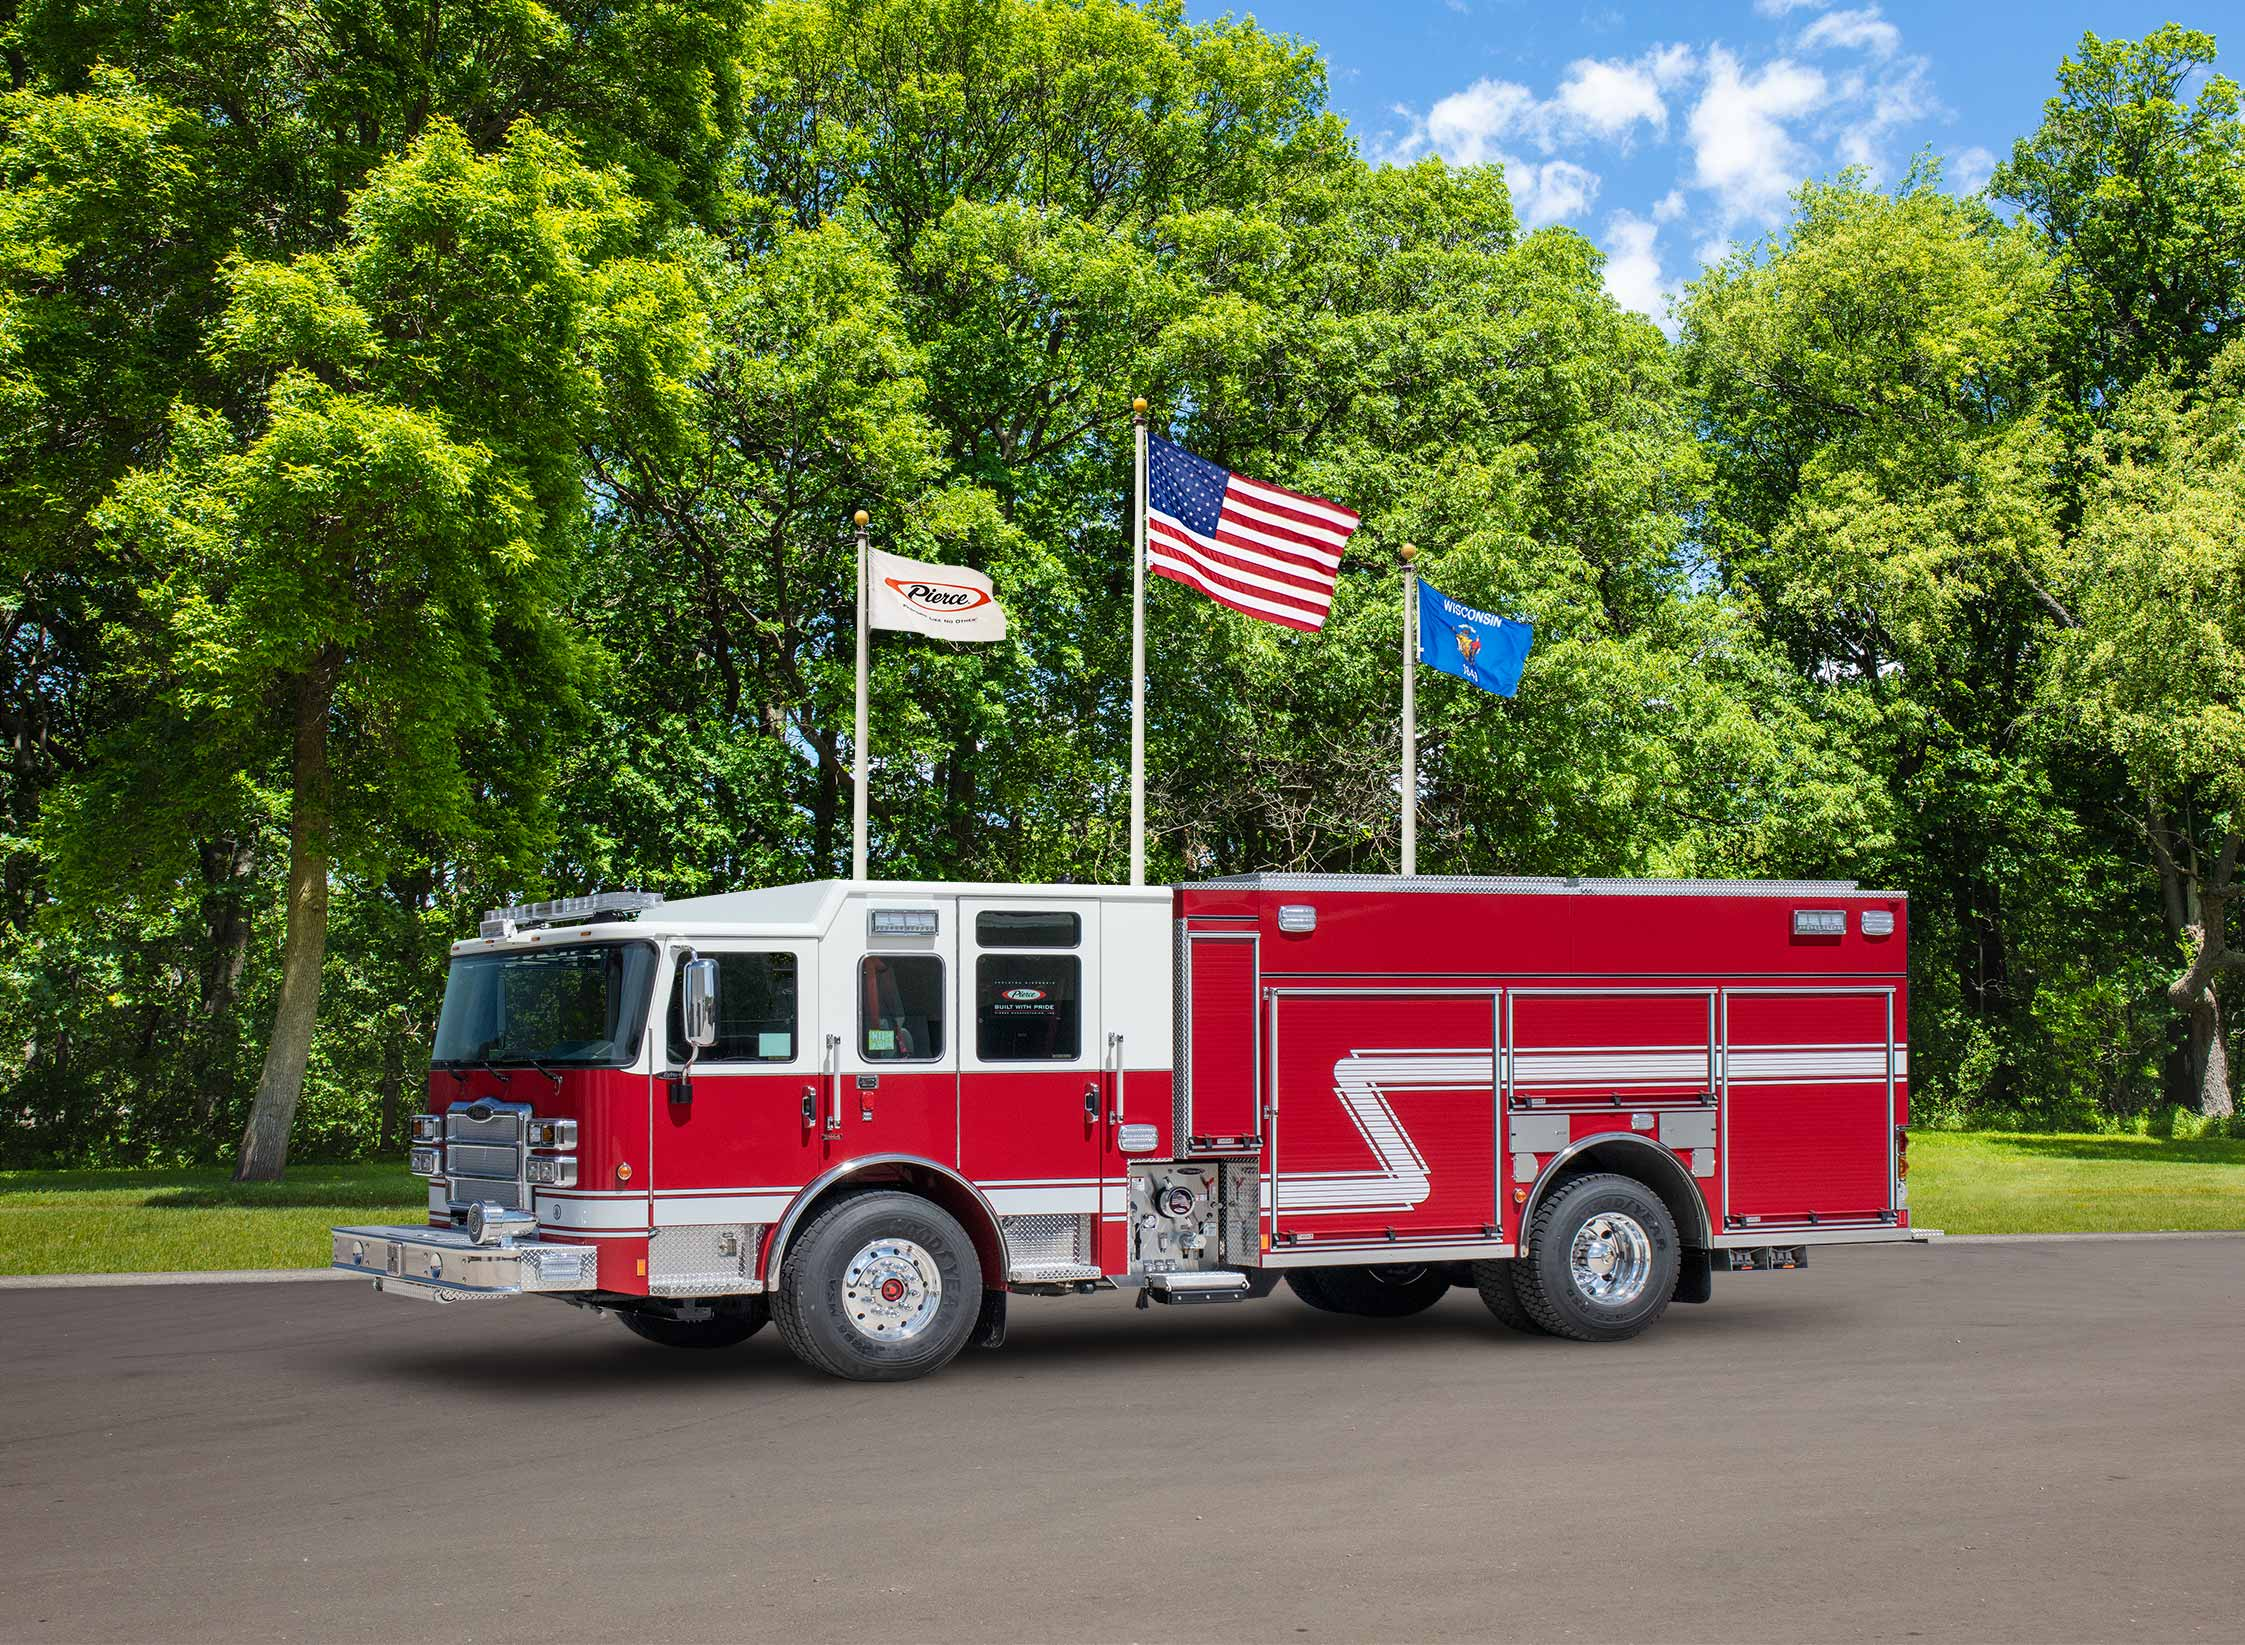 City of Grand Rapids Fire Department - Pumper